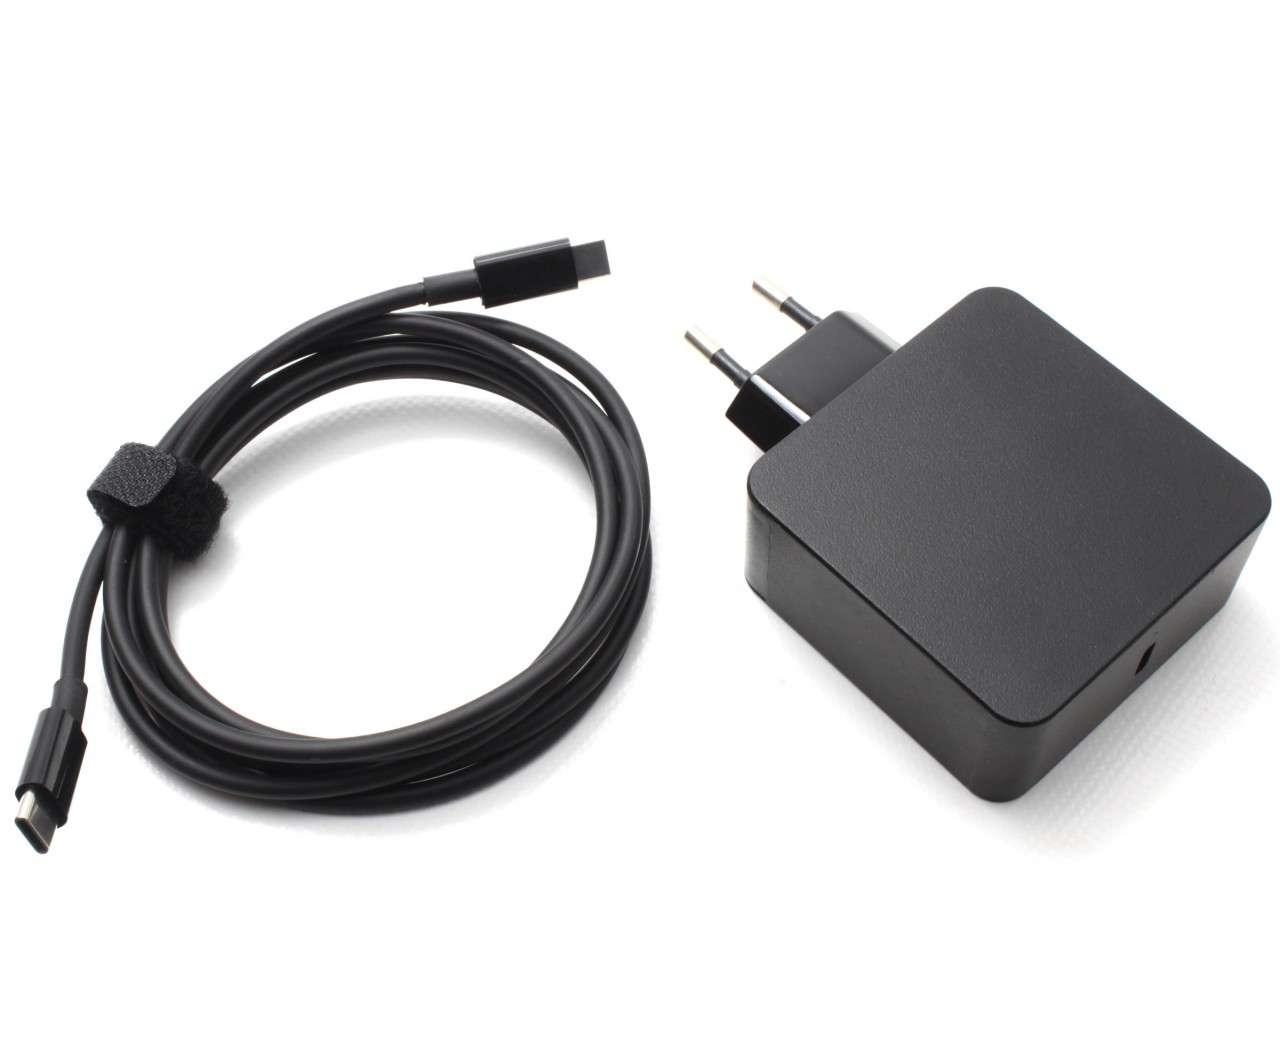 Incarcator HP Spectre X368 13-AE050CA 65W imagine powerlaptop.ro 2021